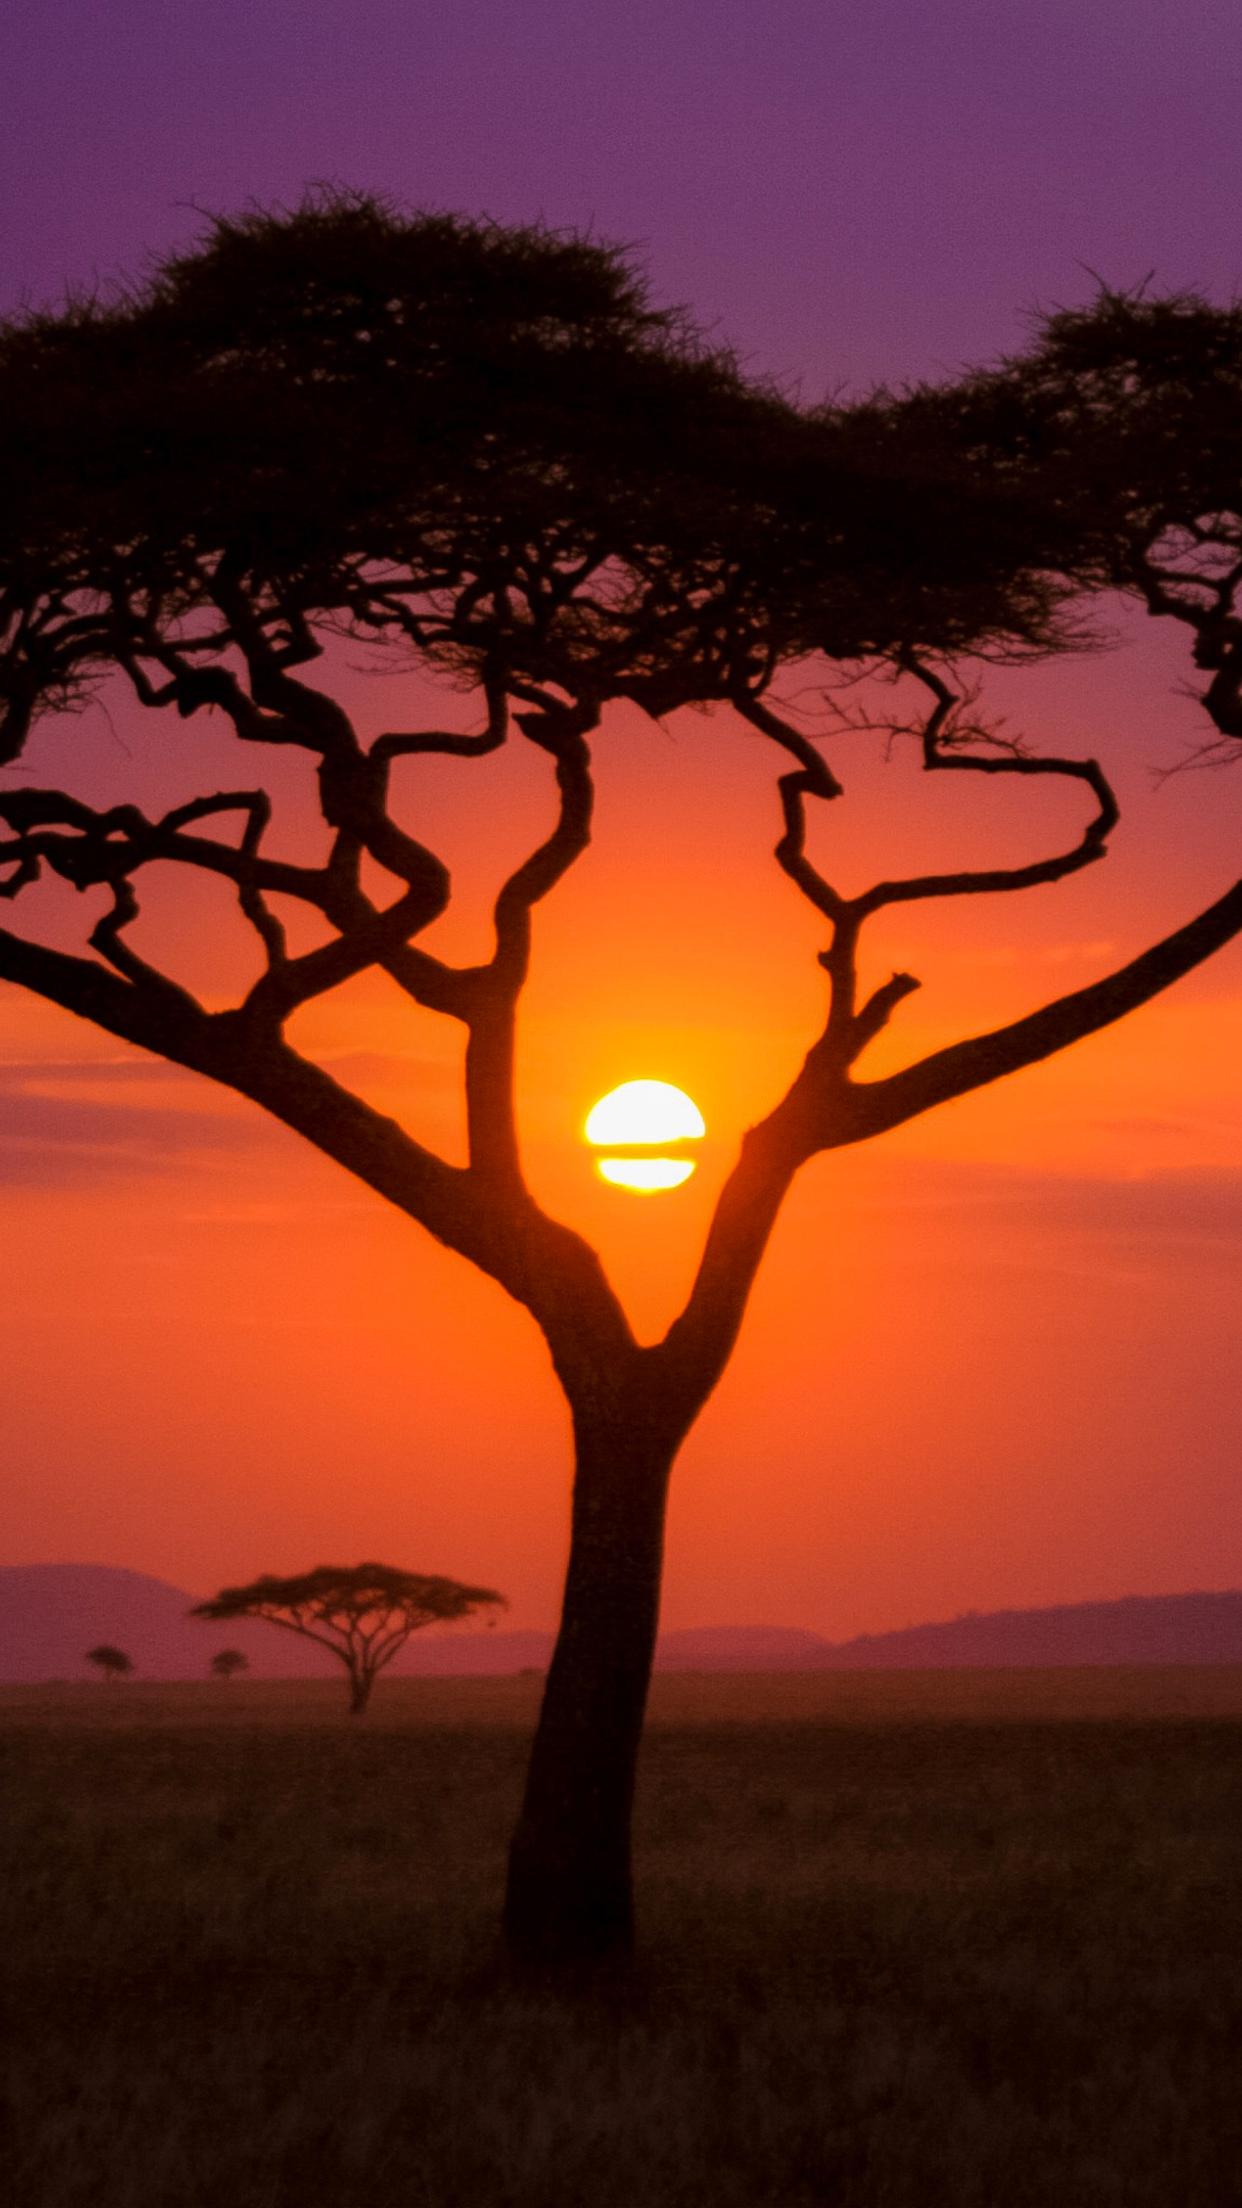 African Sunset 3Wallpapers iPhone Parallax African Sunset